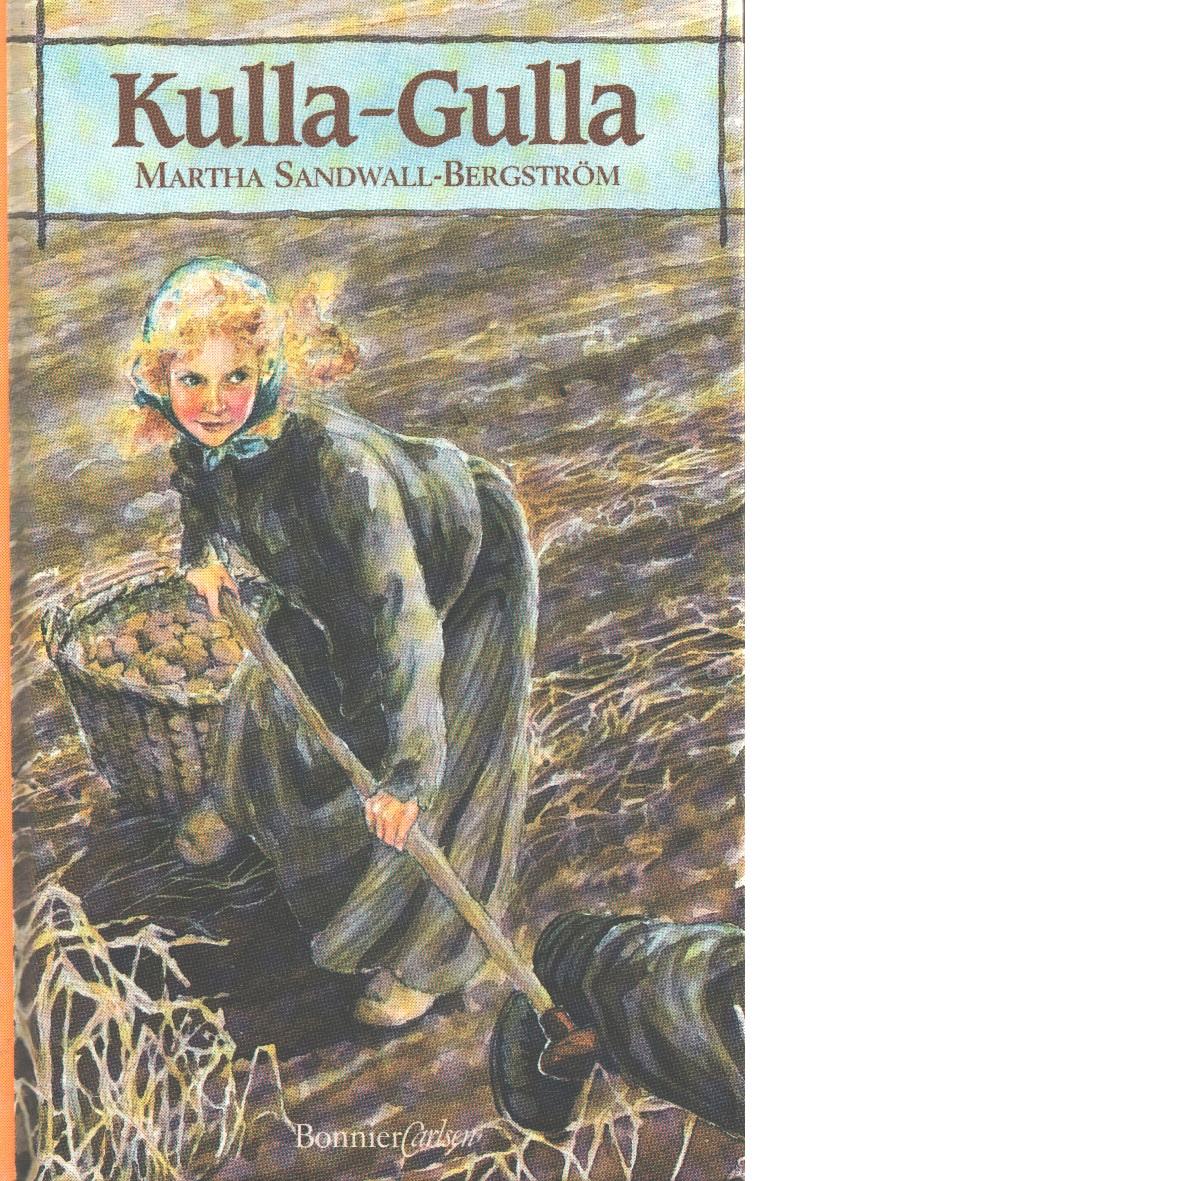 Kulla-Gulla - Sandwall-Bergström, Martha